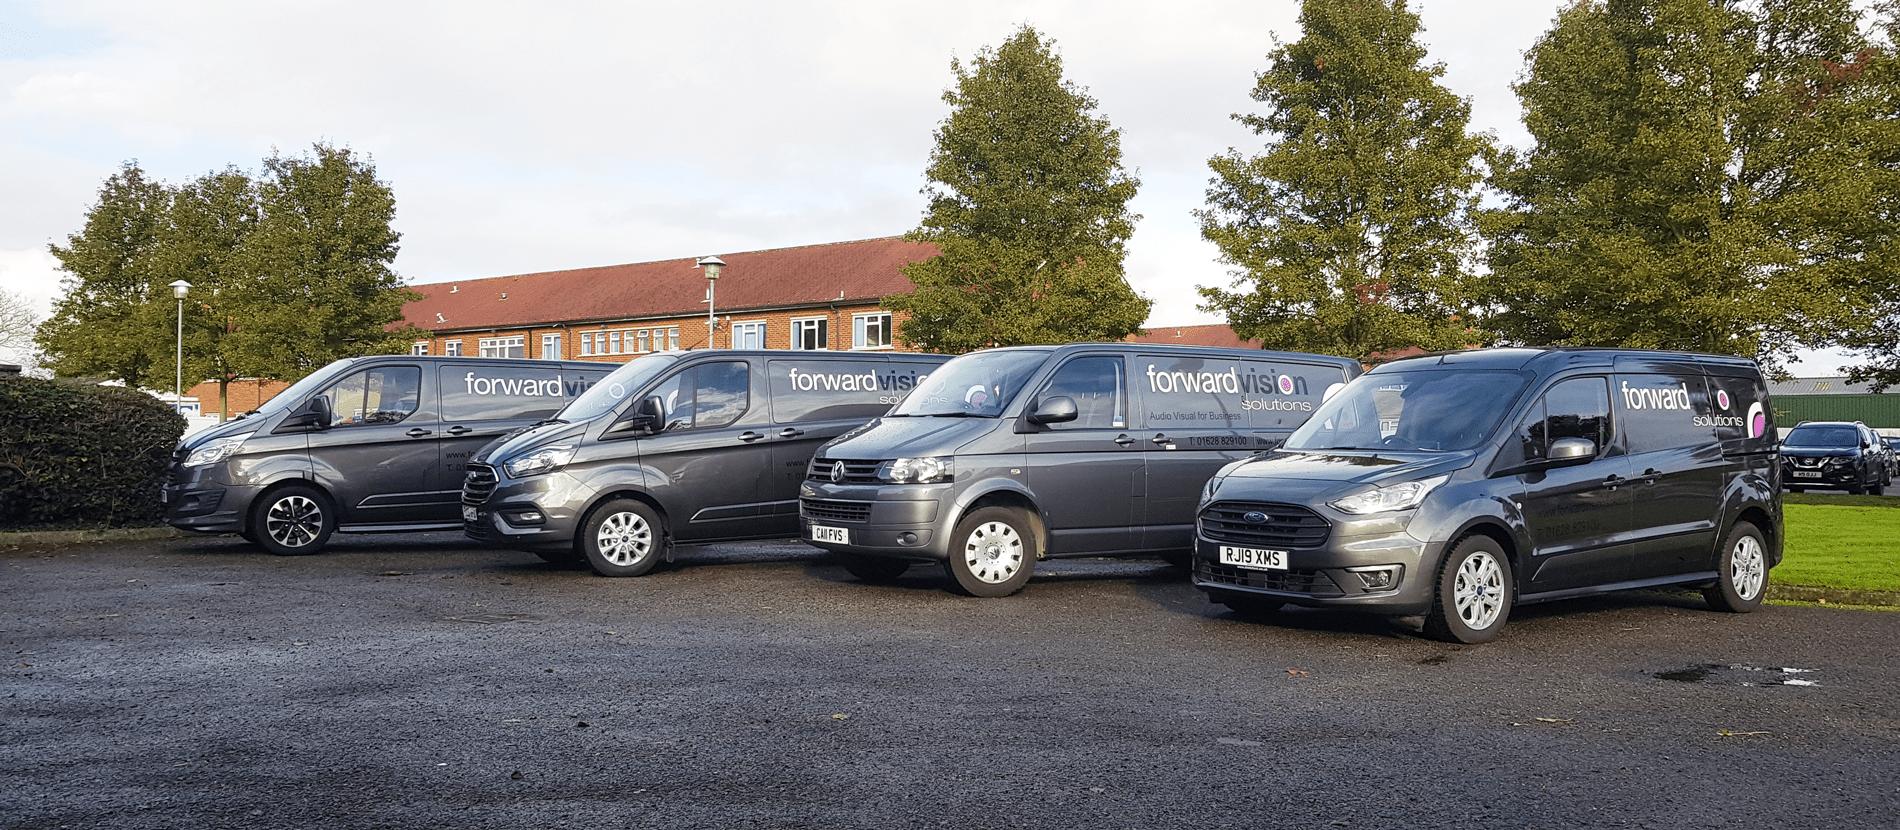 Forward visions Vans